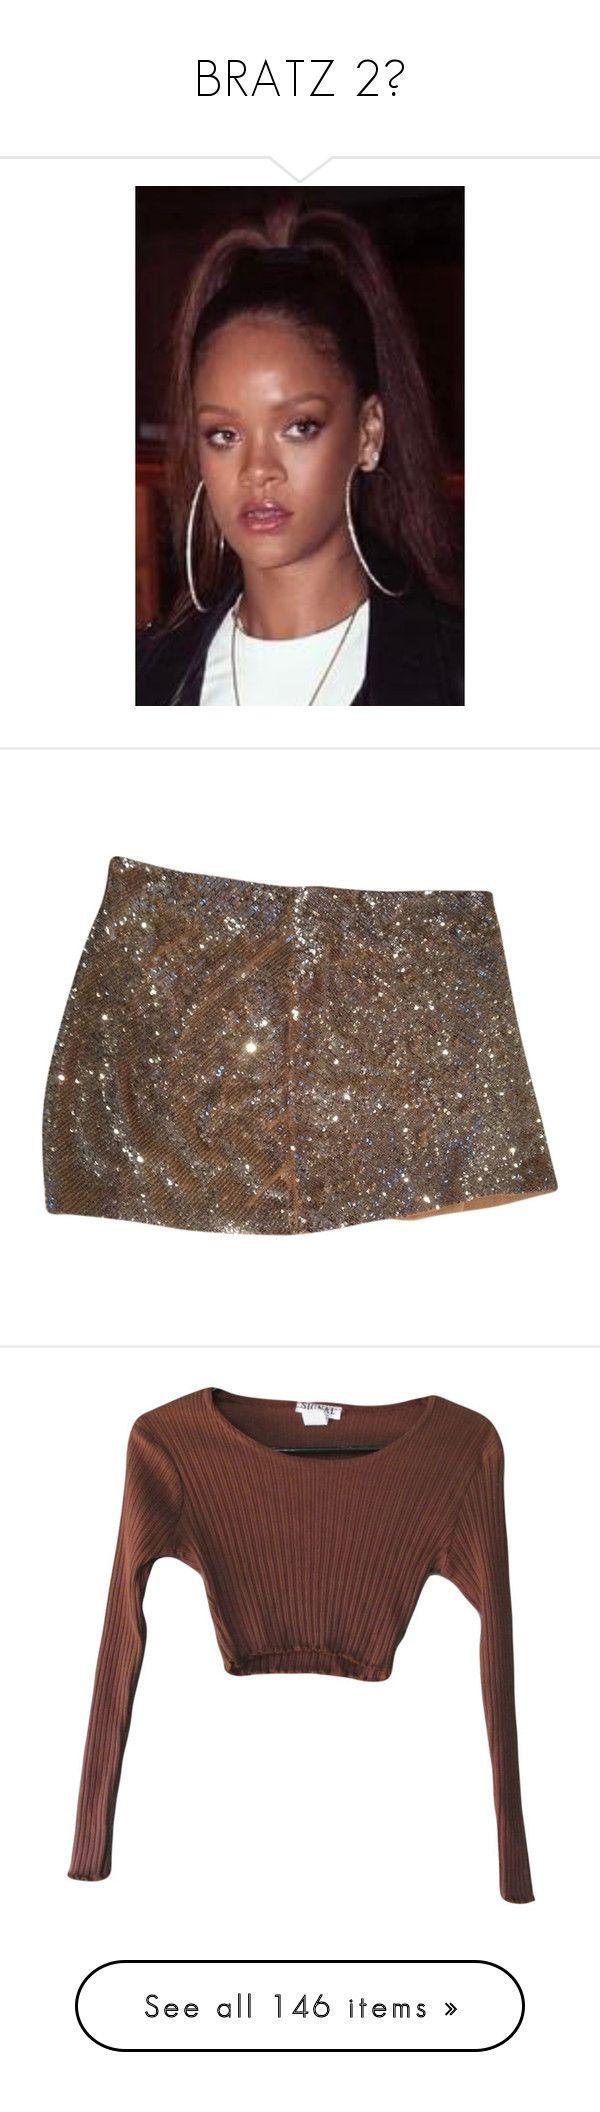 """BRATZ 2💋"" by theindigochild ❤ liked on Polyvore featuring skirts, mini skirts, bottoms, pants, silver sequin, brown skirt, short mini skirts, haute hippie, brown mini skirt and haute hippie skirt"